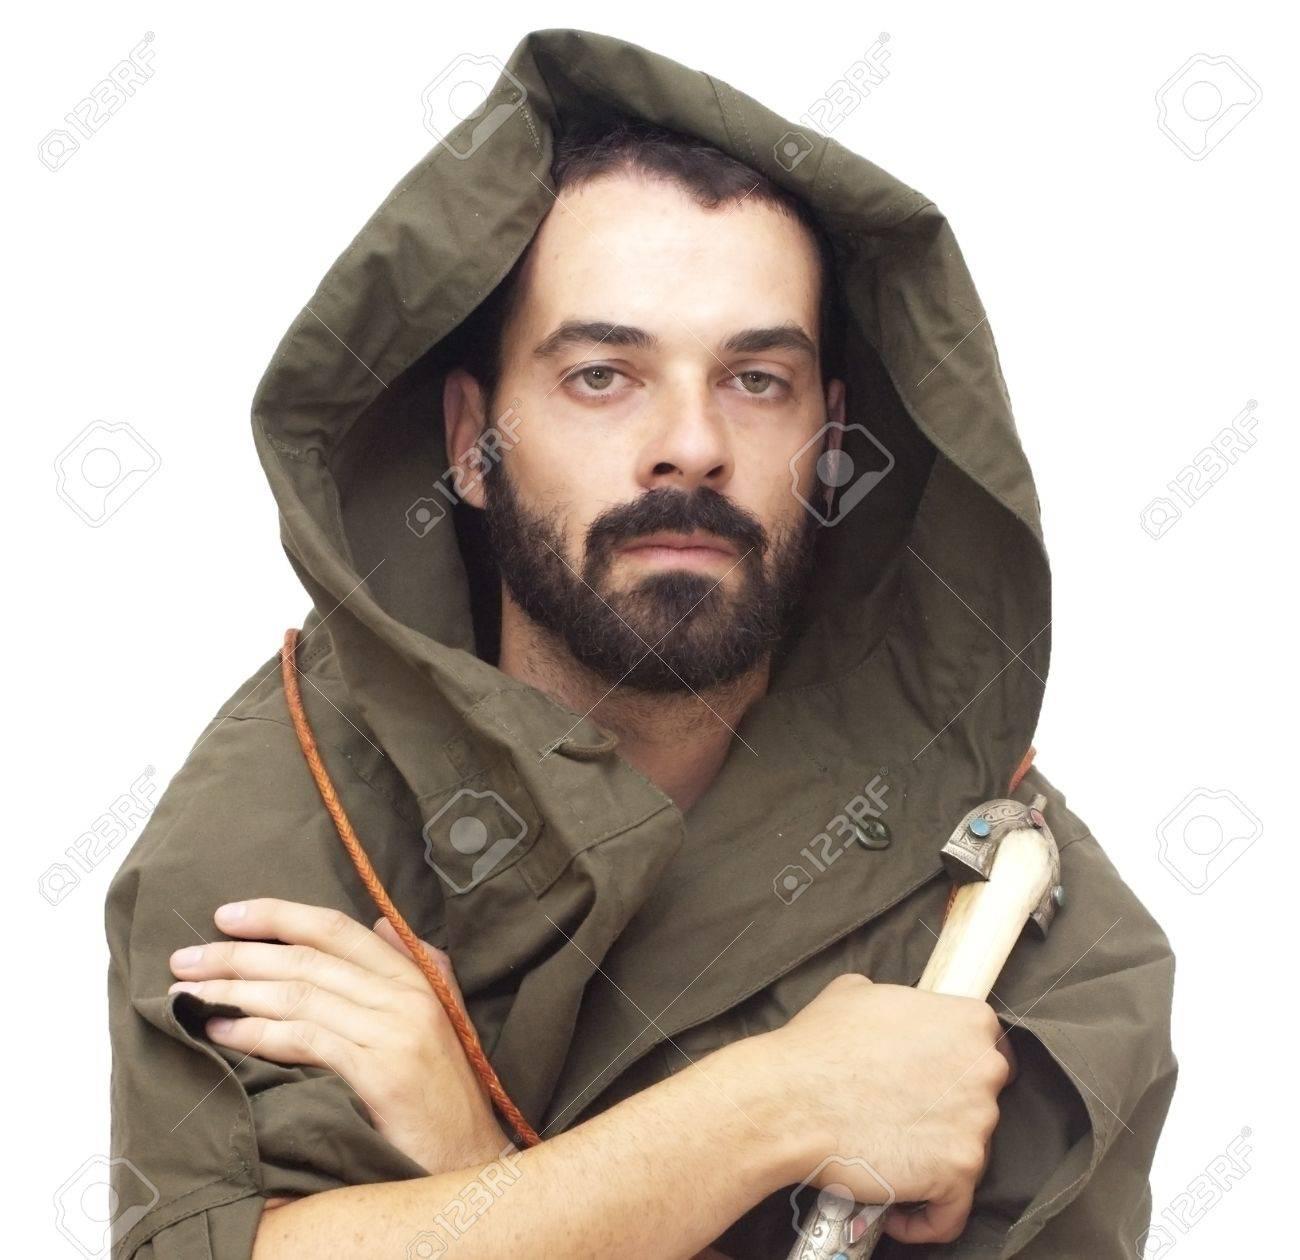 Hairy arab guy